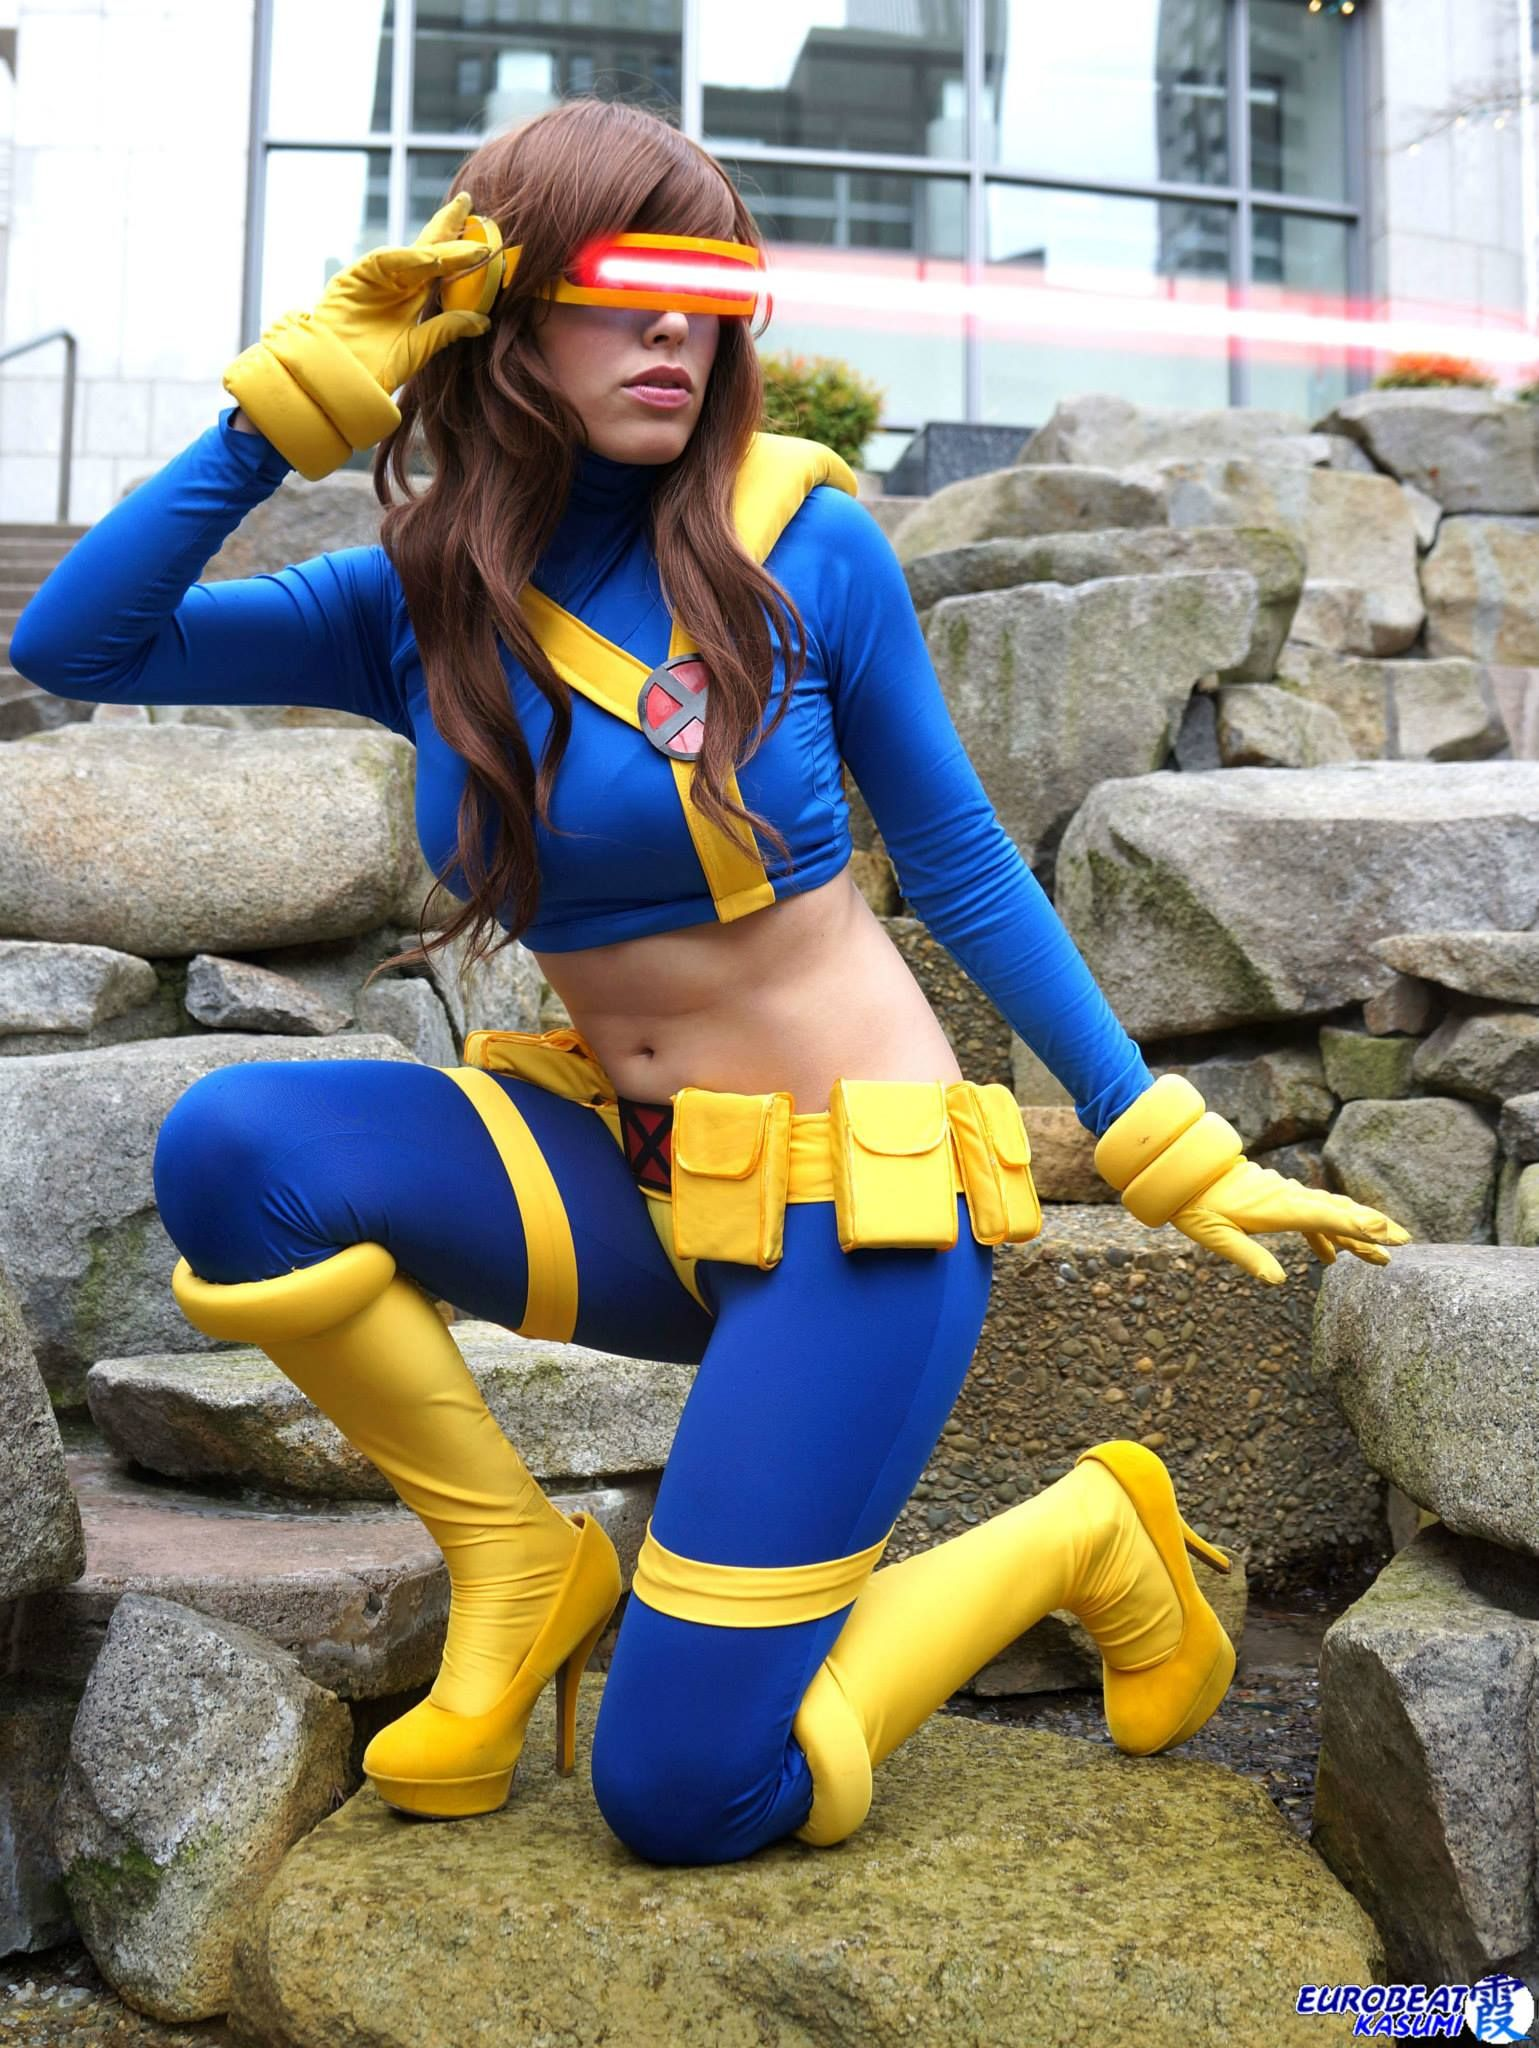 Cyclops (Genderbent) from X-Men Cosplayer: Nadyasonika Photographer: Eurobeat Kasumi Photography PShopping: Ithlia Source: Eurobeat Kasumi Photography via Facebook